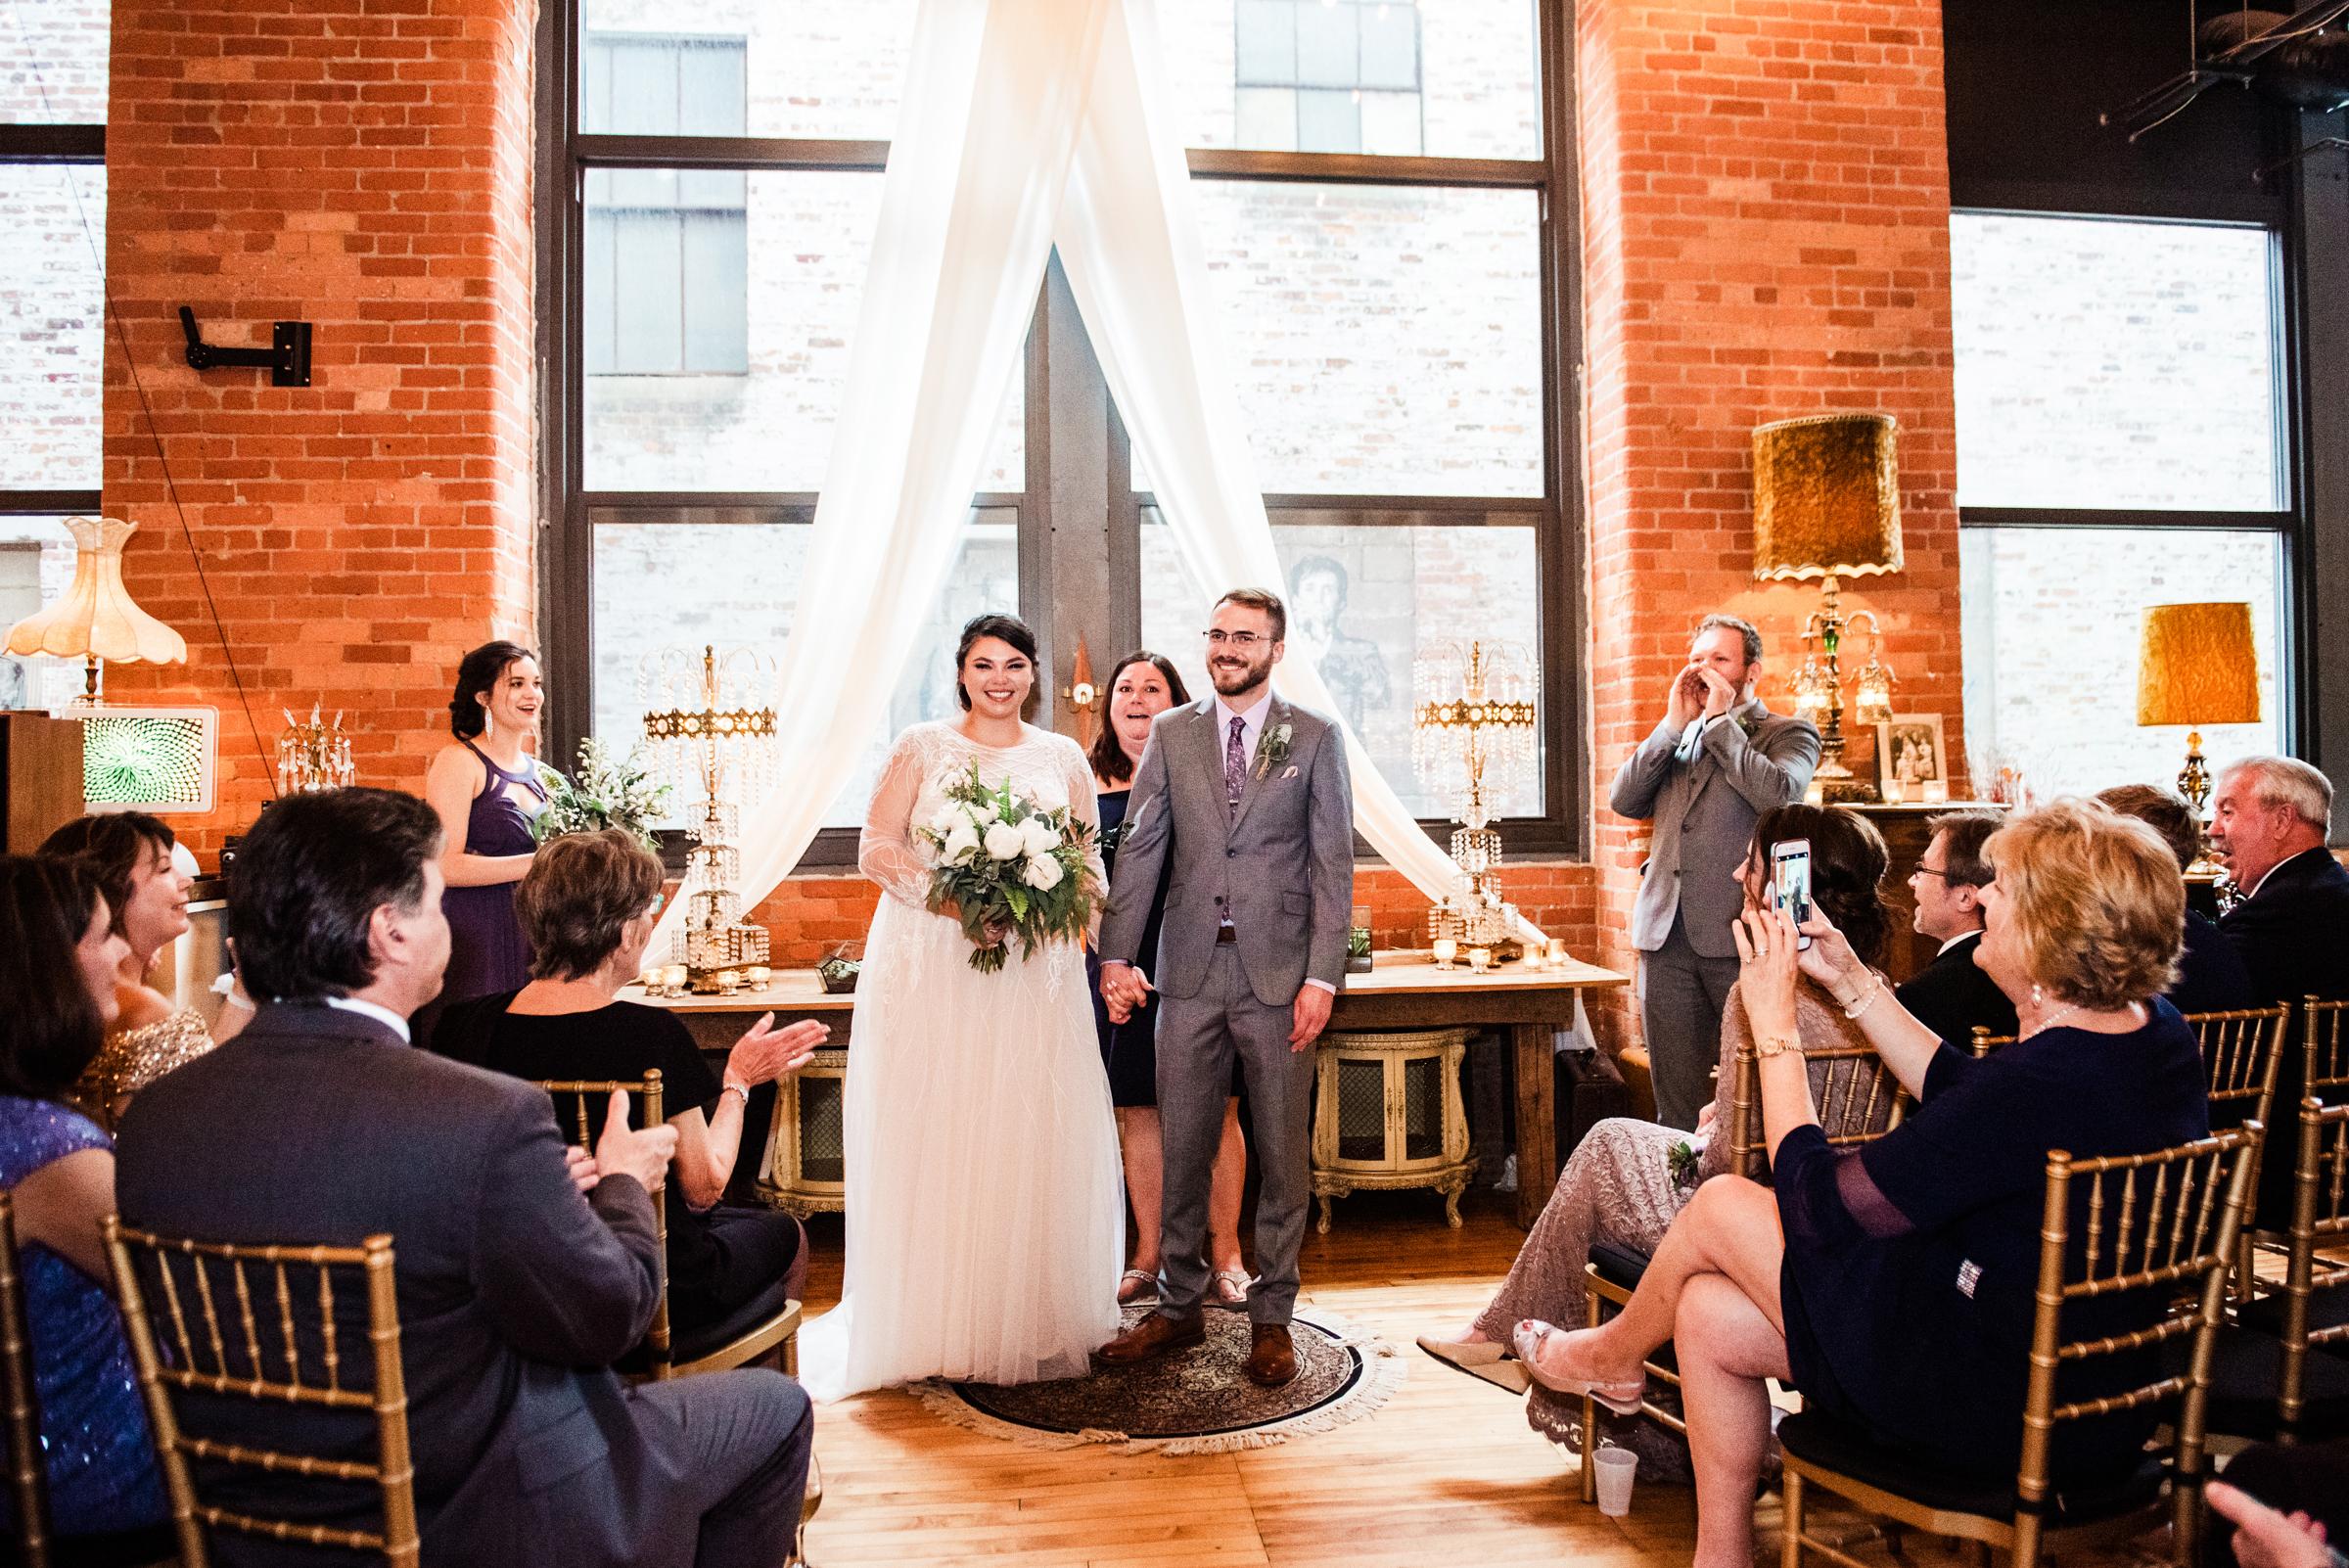 Studio_180_Lamberton_Conservatory_Rochester_Wedding_JILL_STUDIO_Rochester_NY_Photographer_DSC_8970.jpg